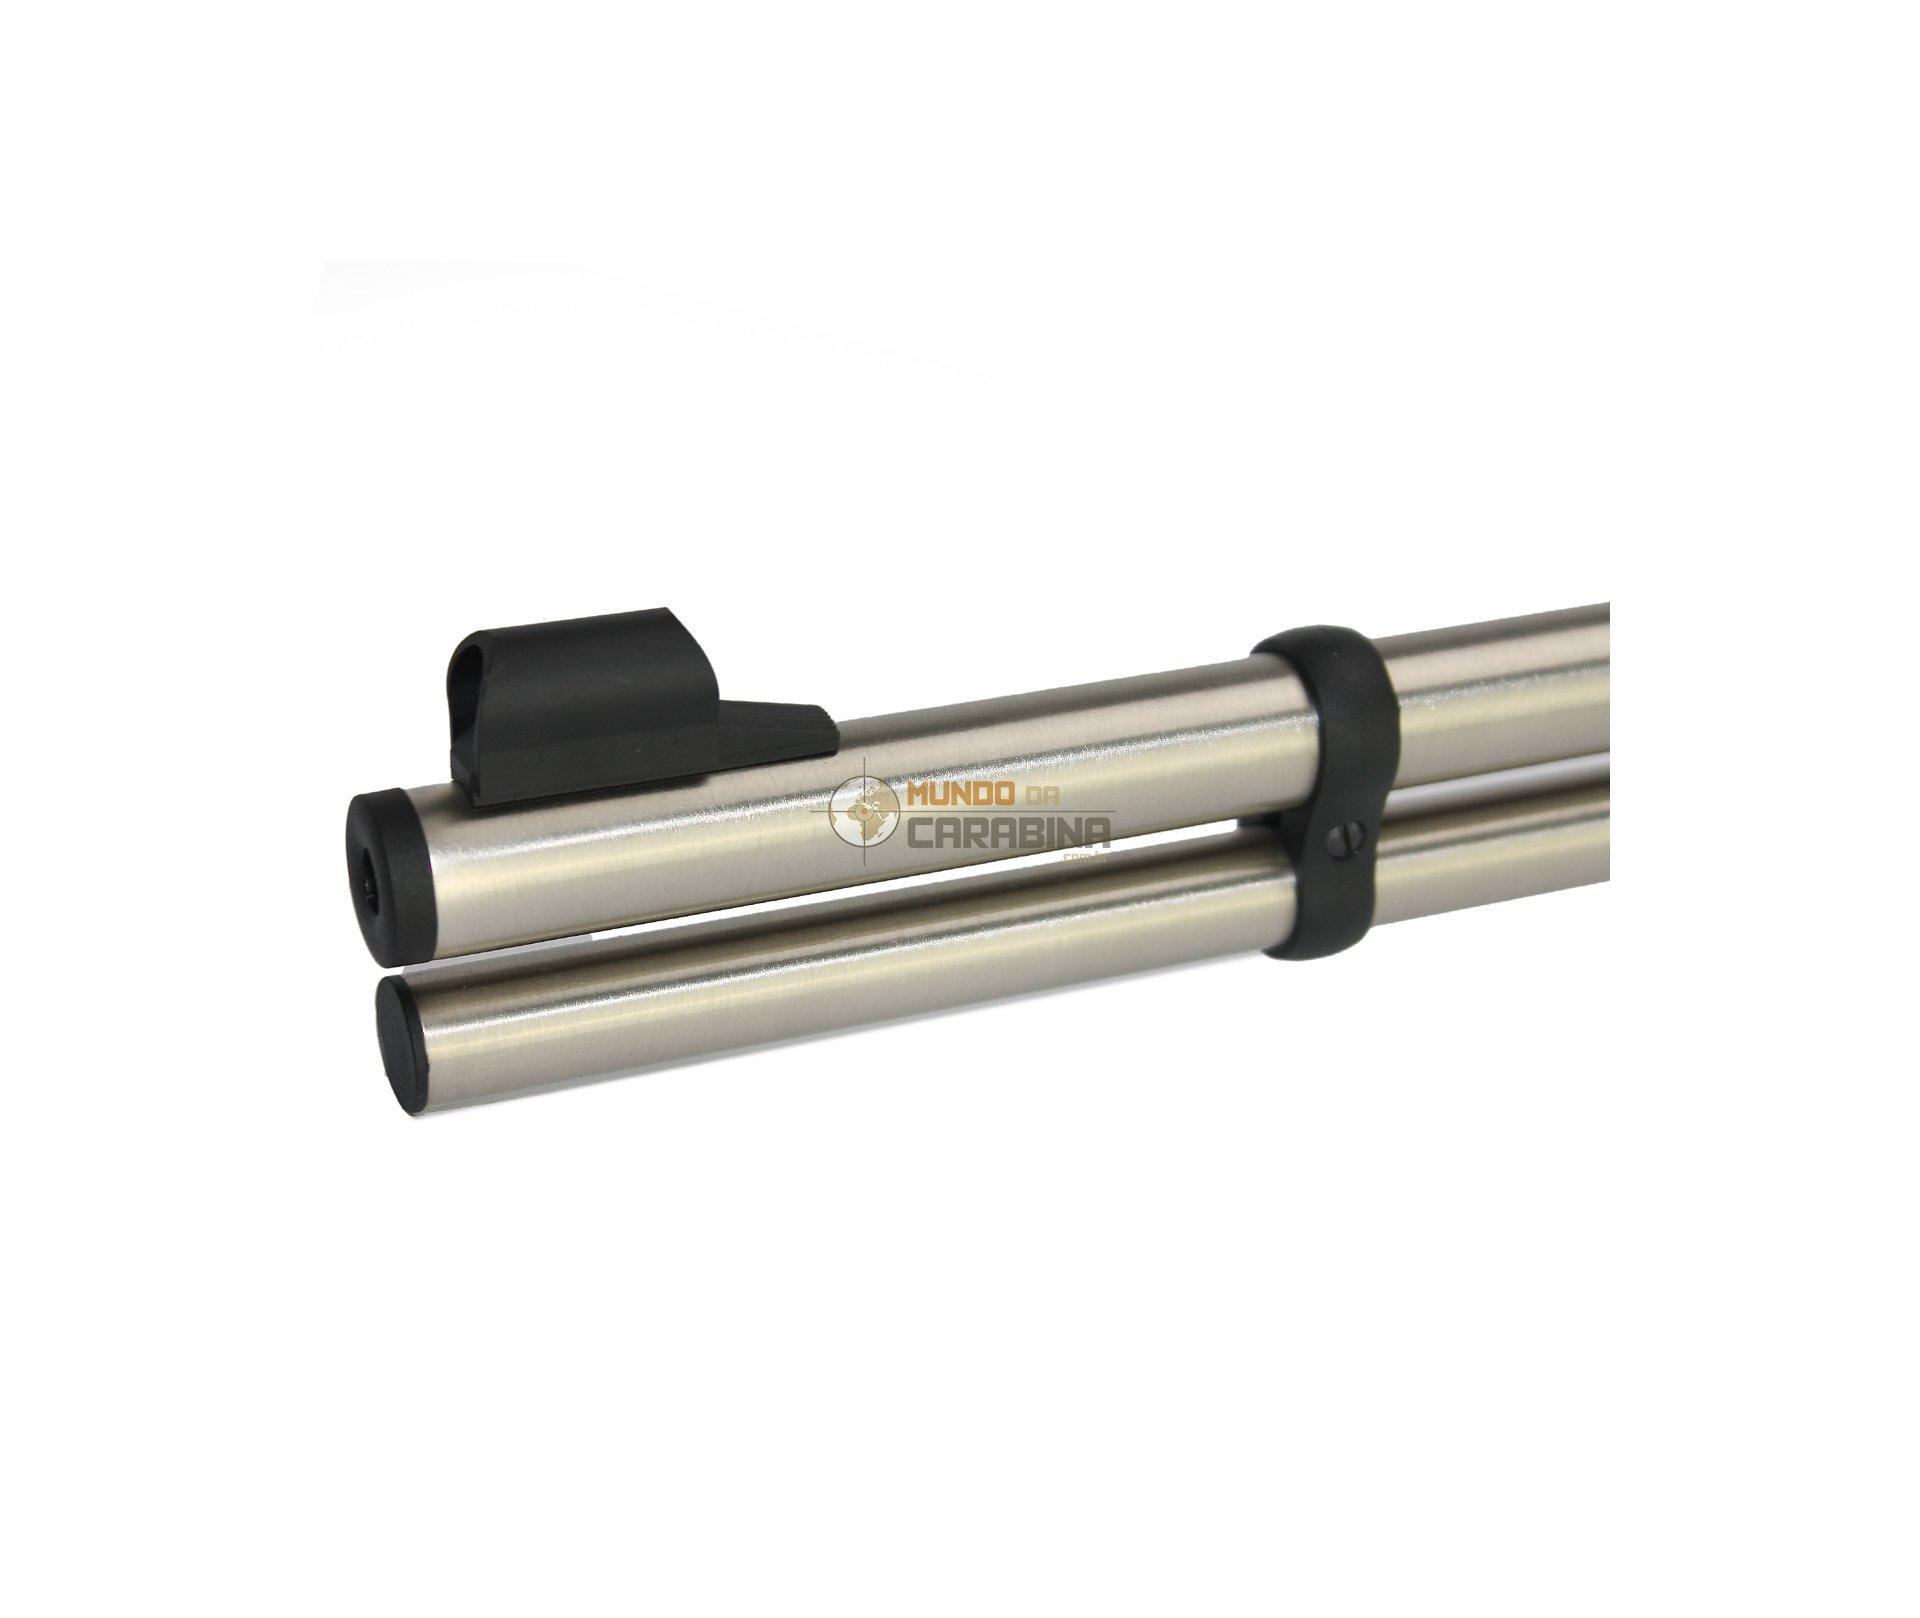 Carabina De Pressão Pcp Puma Walther Lever Action Inox 4,5mm 8 Tiros - Walther